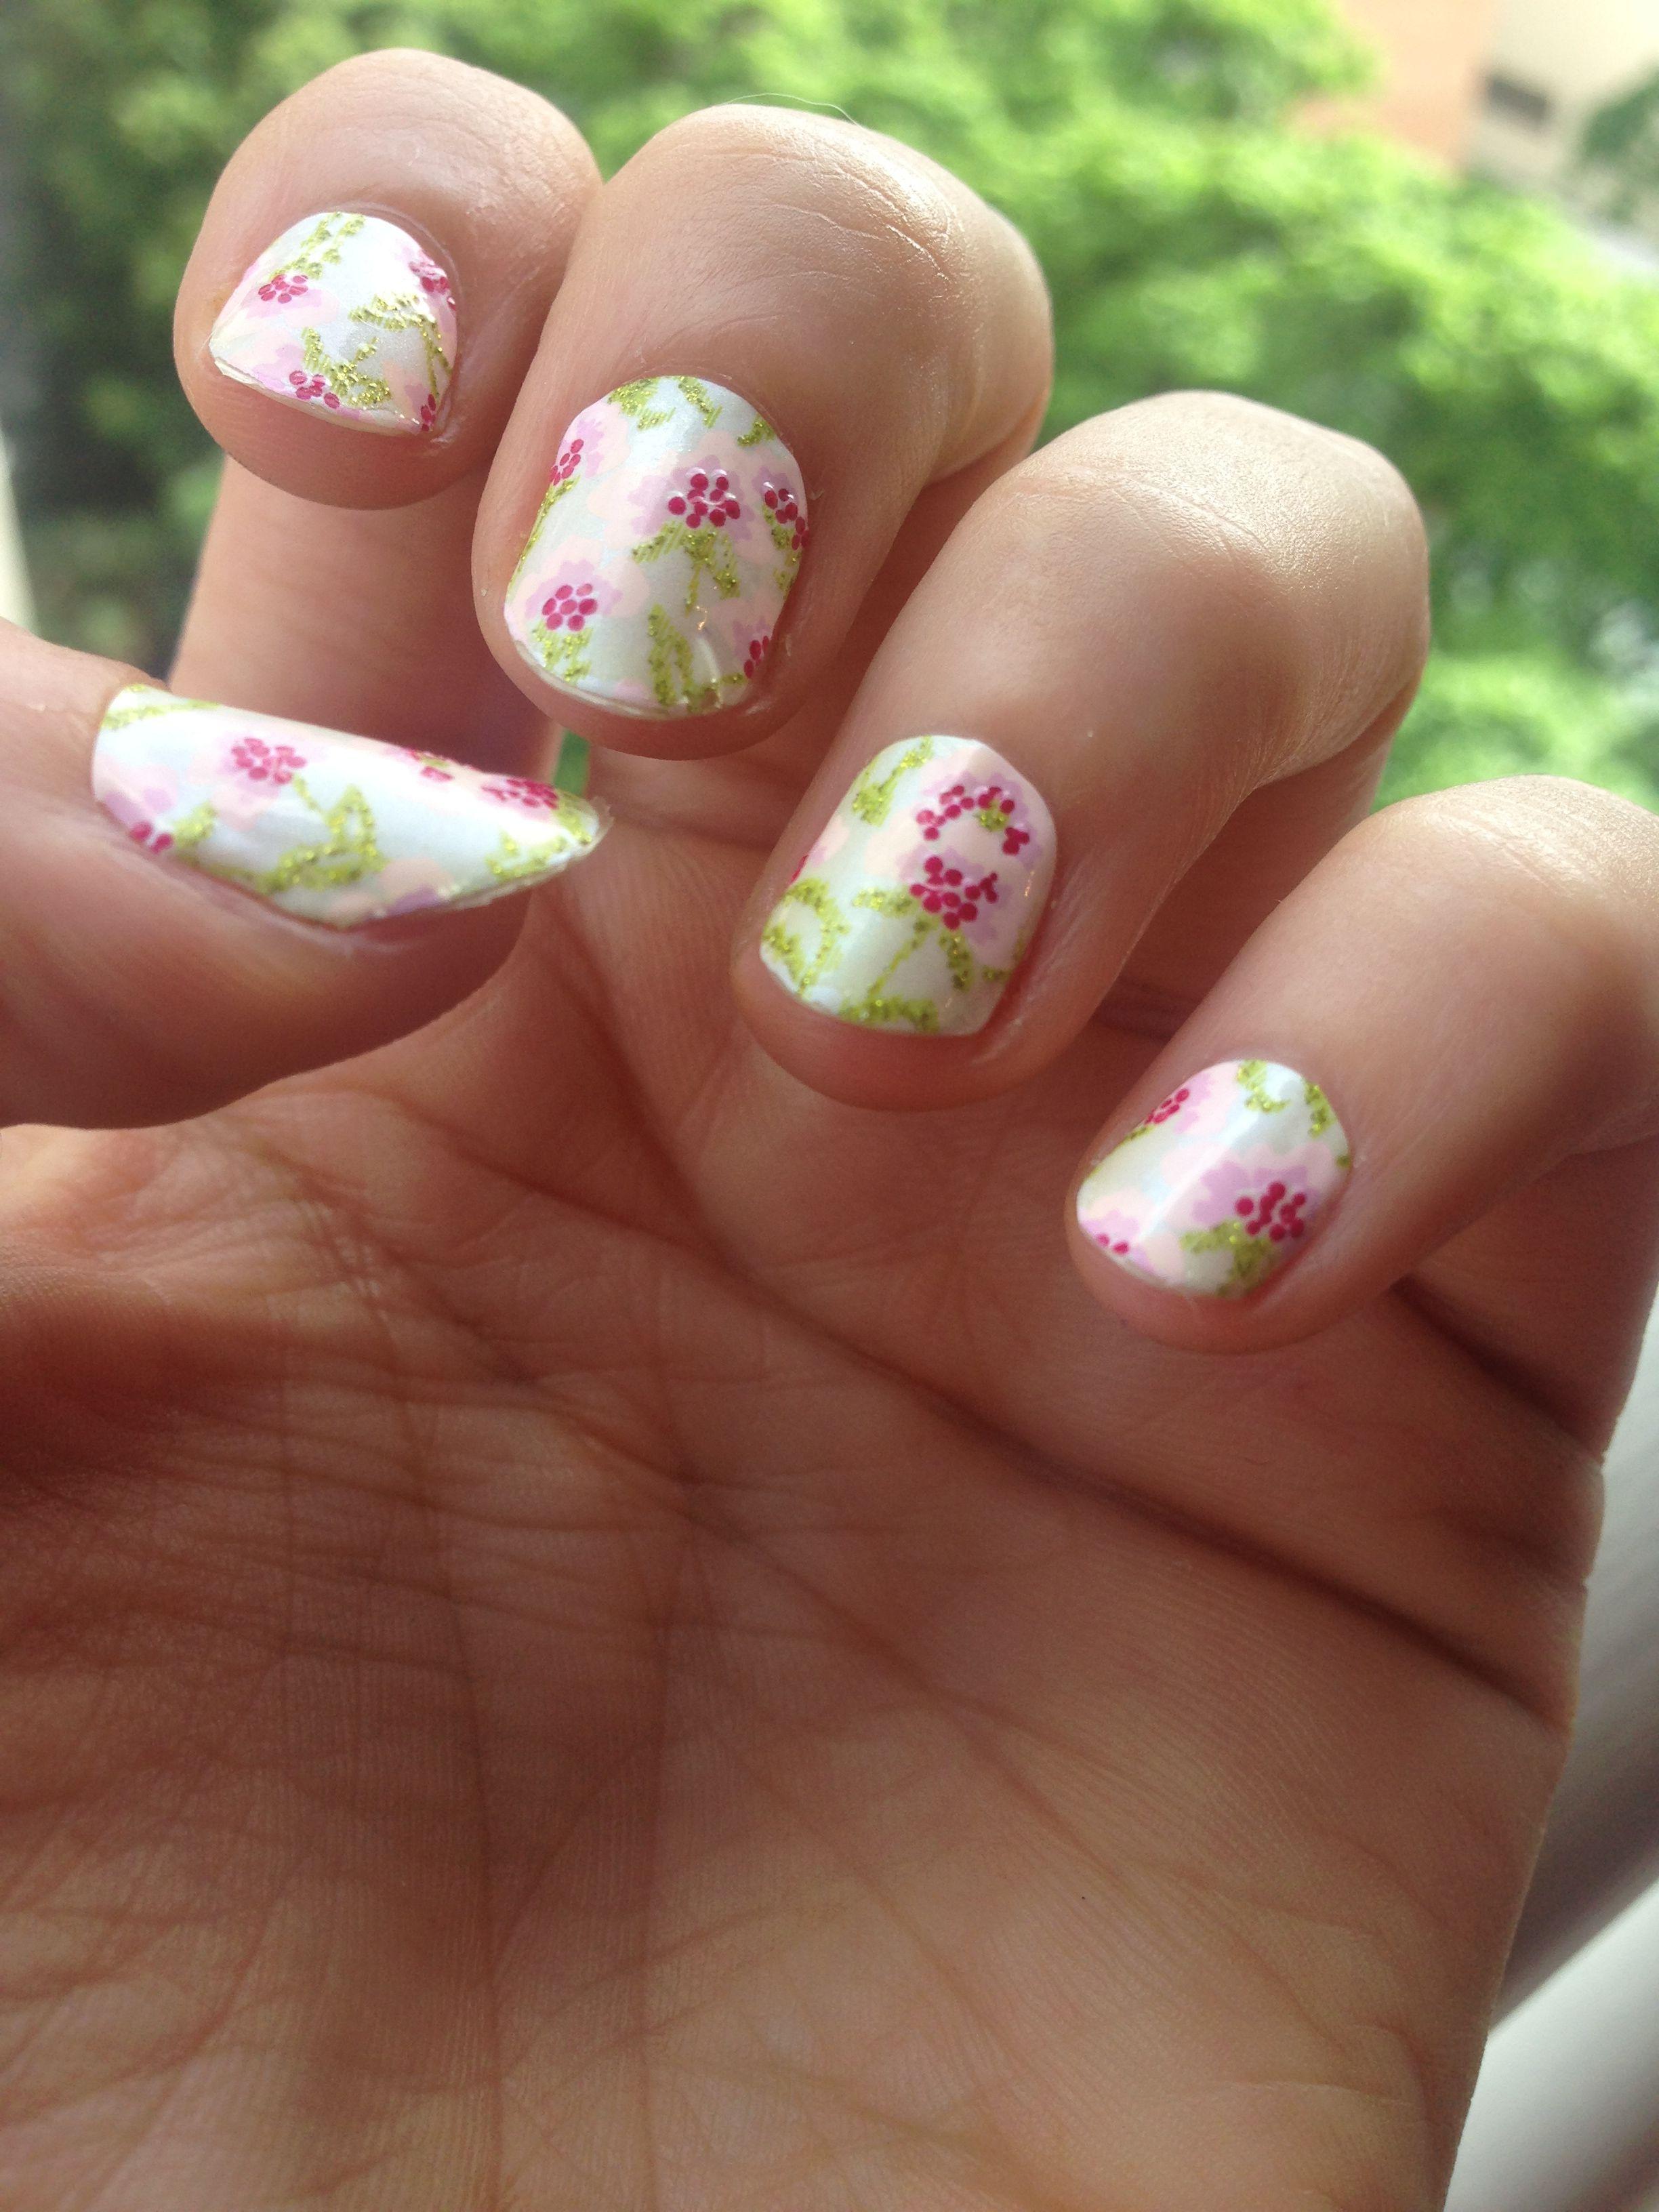 Revlon 3D jewel nail art stickers   makeup   Pinterest   Jewel nails ...